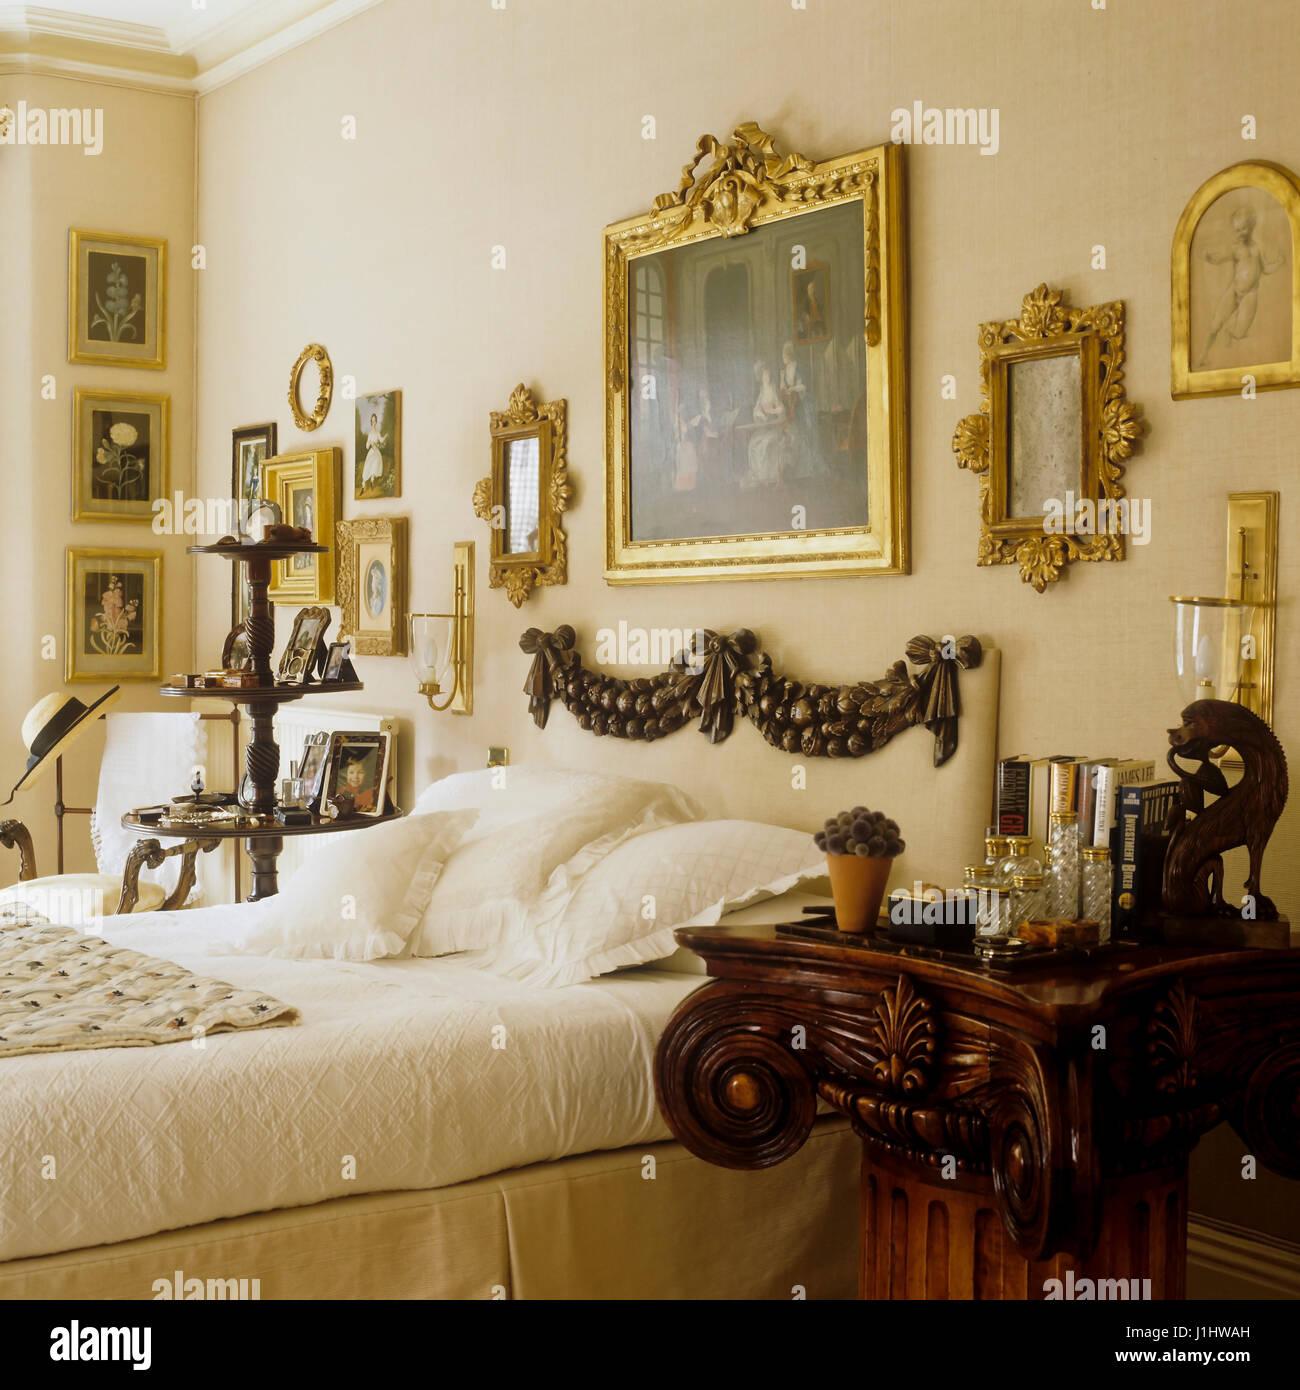 Opulent home interior stock photos opulent home interior for Opulent bedrooms